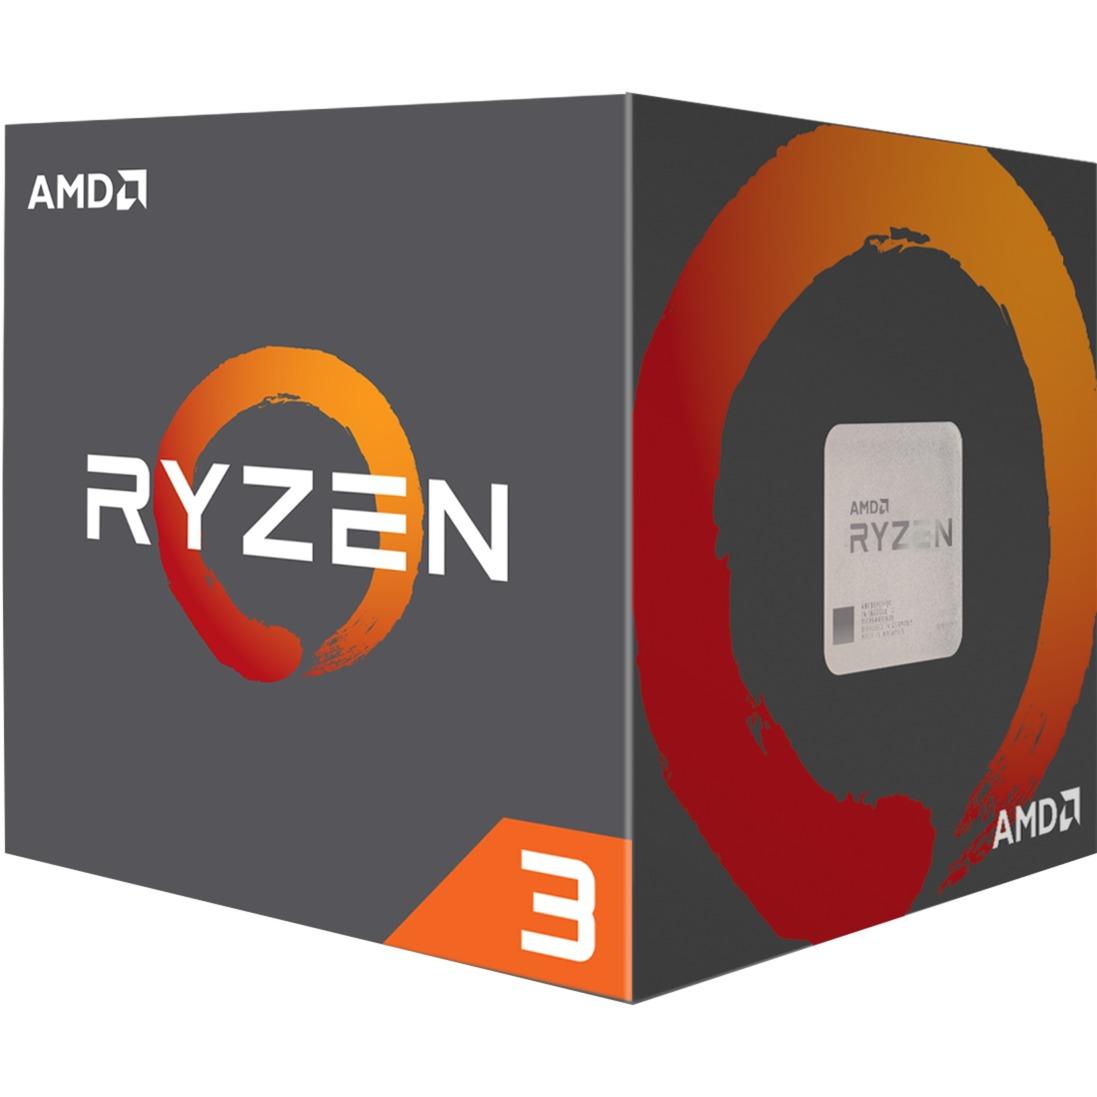 Ryzen 3 1200 procesador 3,1 GHz Caja 8 MB L3